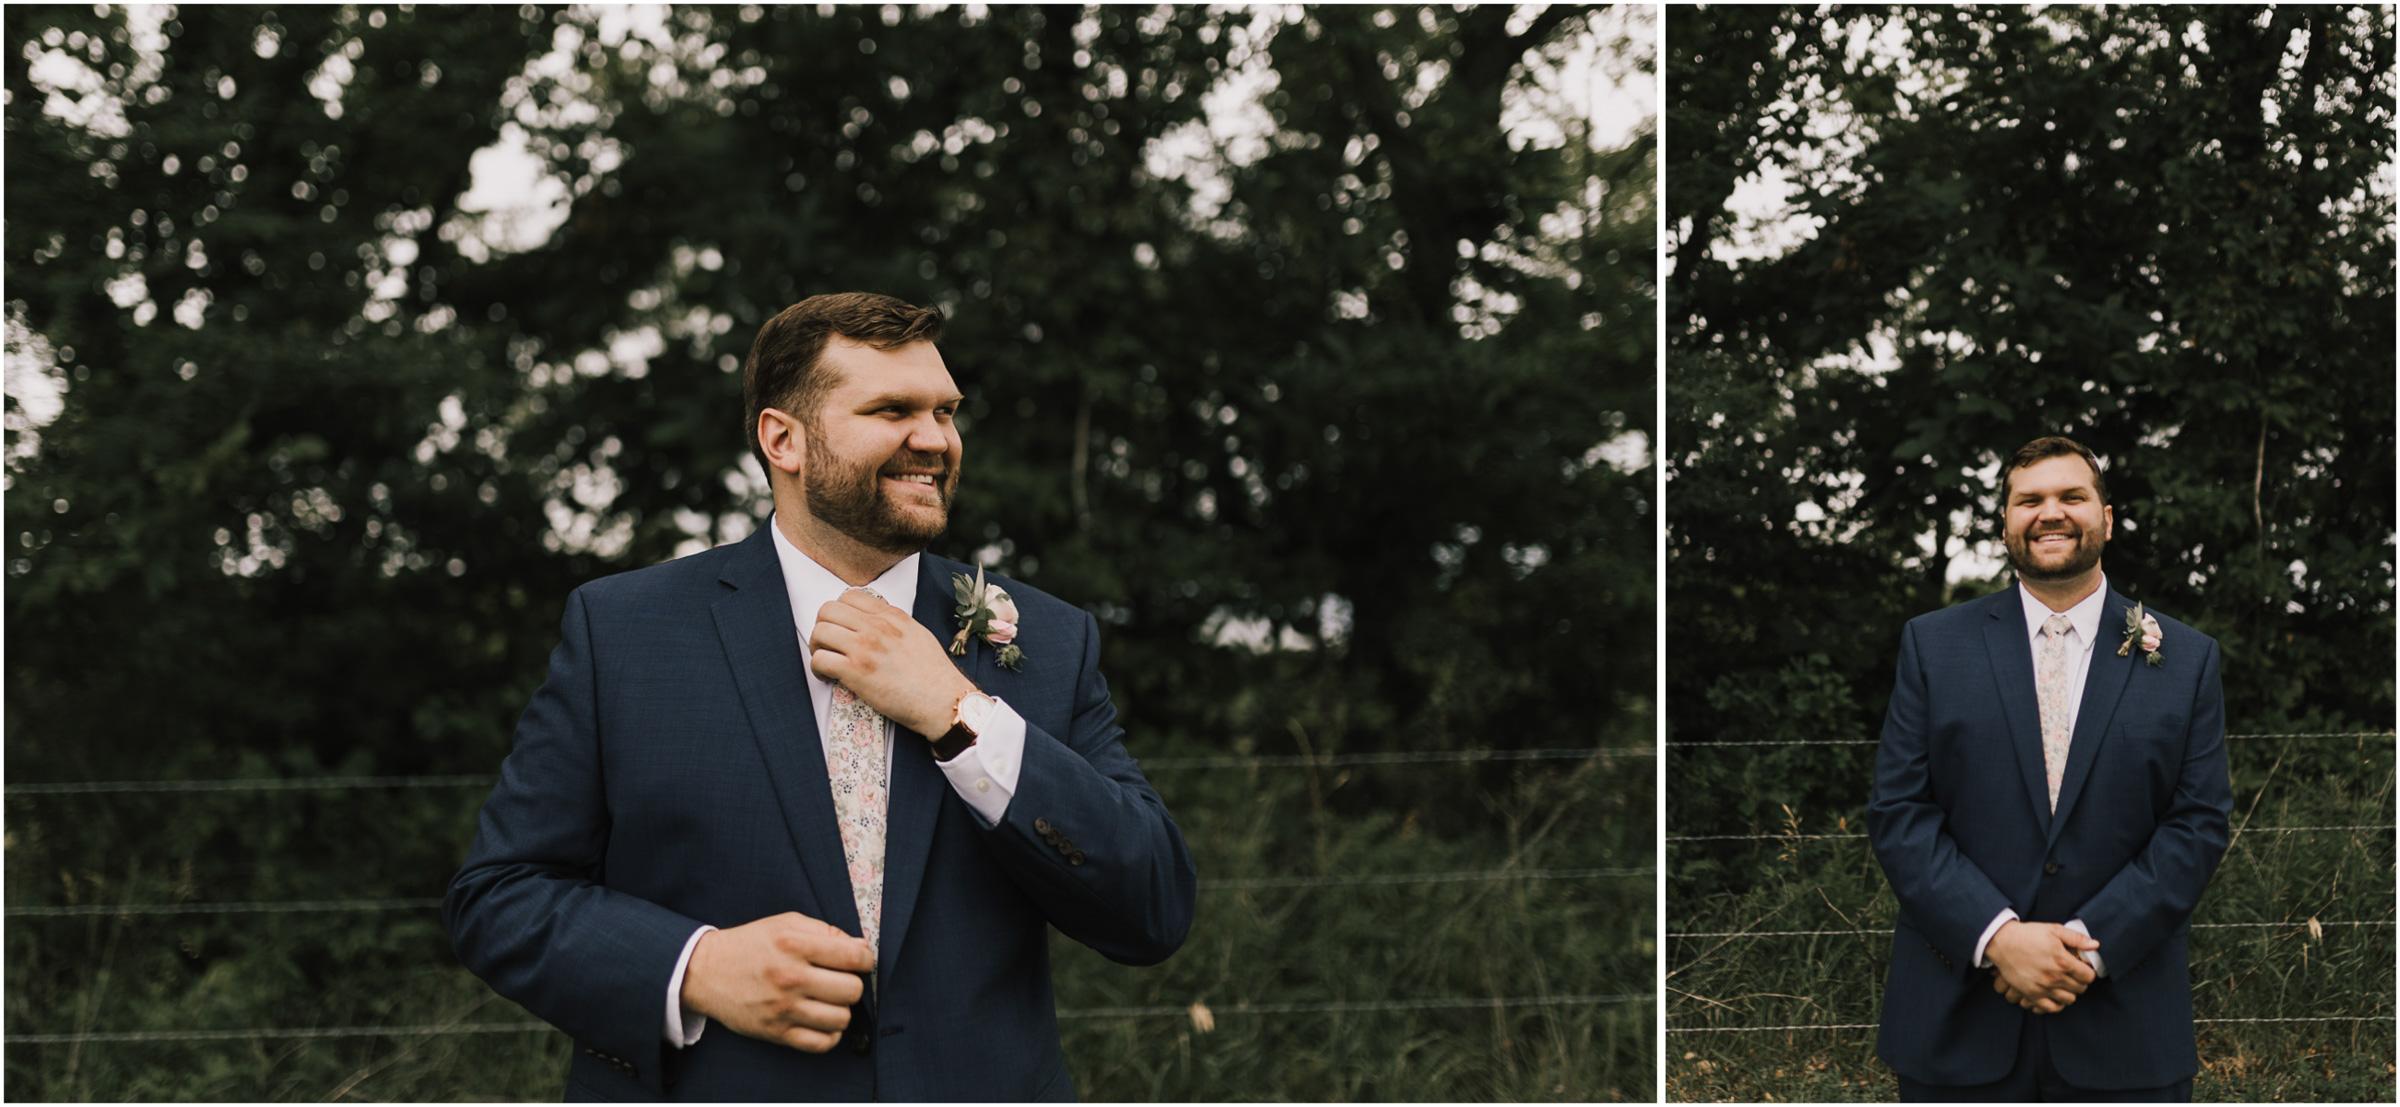 alyssa barletter photography summer odessa missouri wedding kansas city photographer-41.jpg